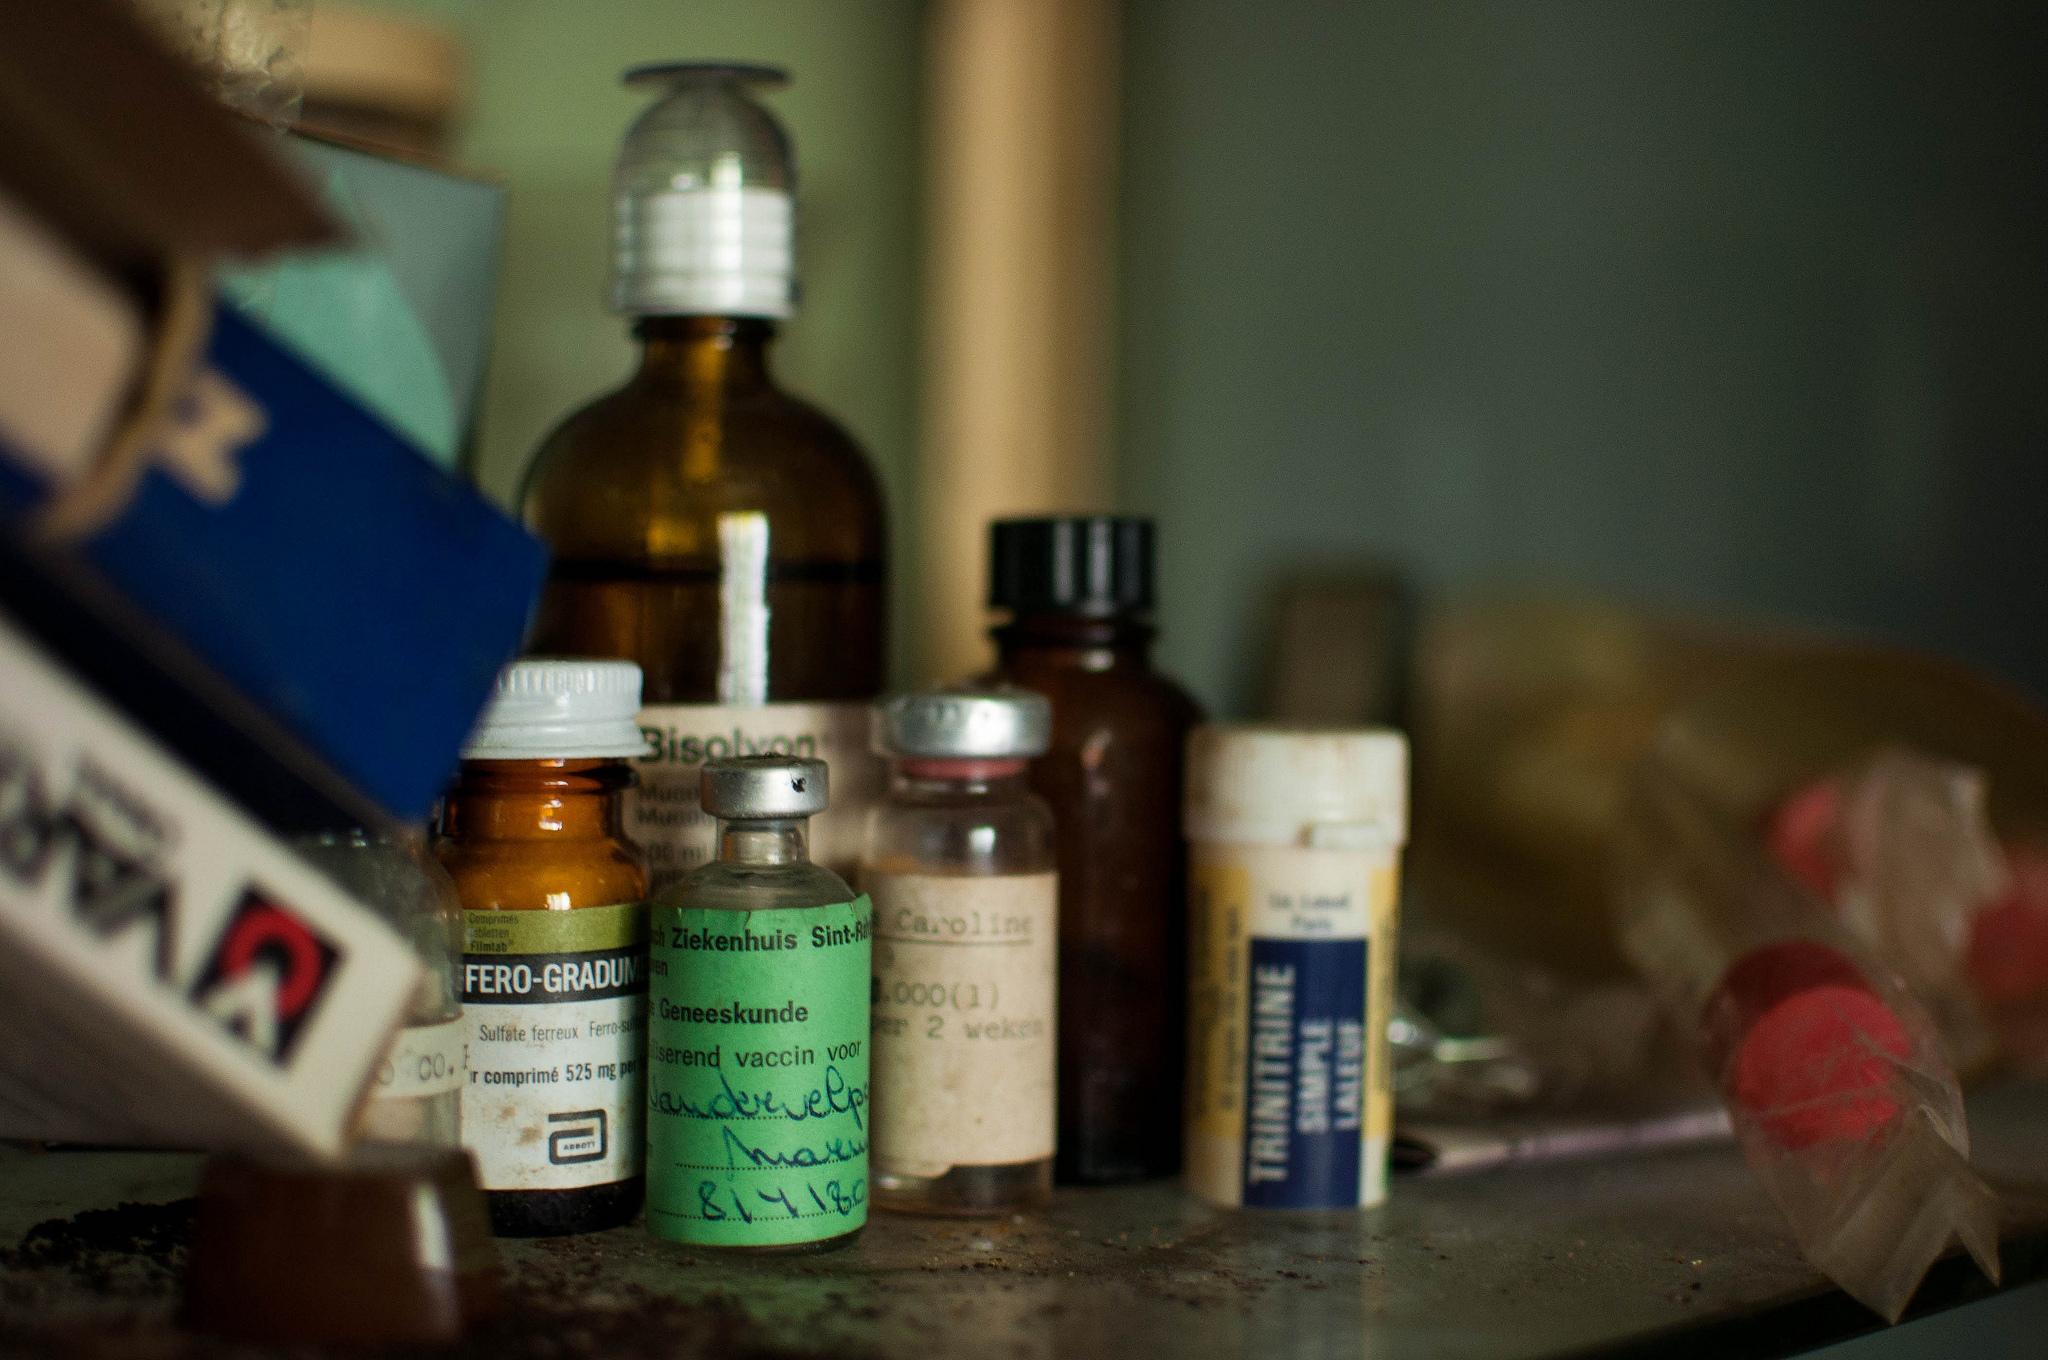 alcohol addiction vs opiate addiction